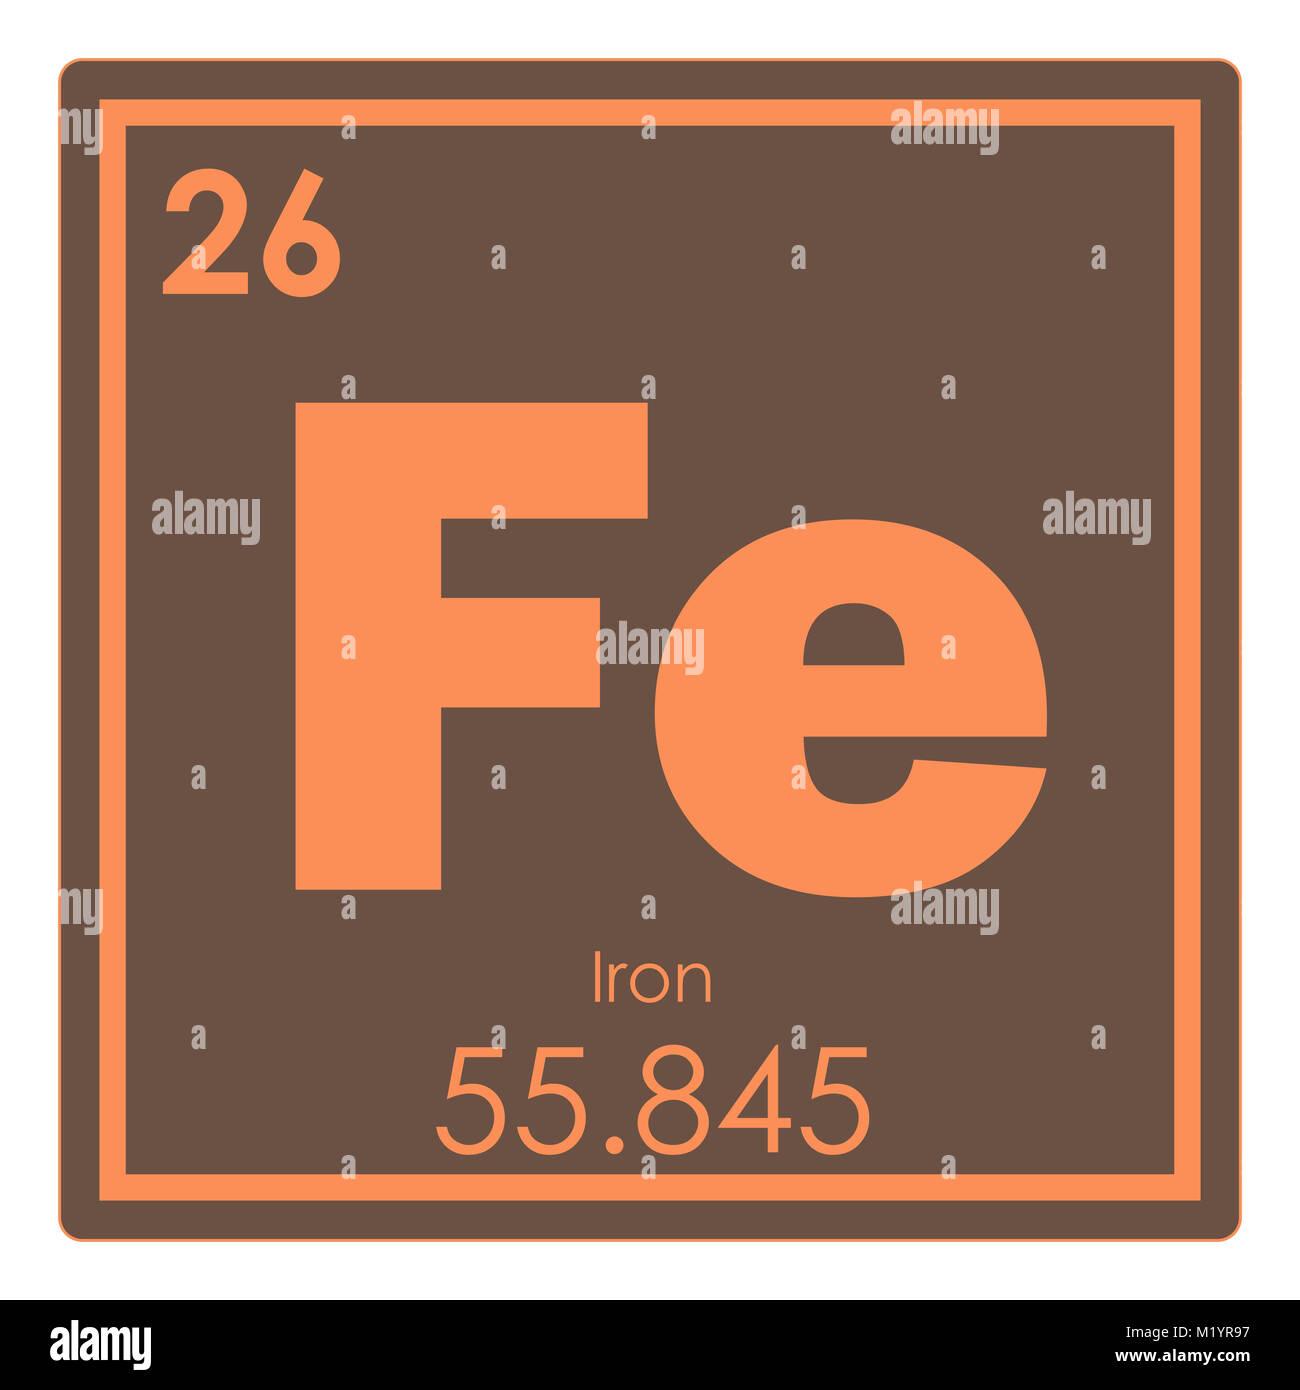 Iron chemical element stock photos iron chemical element stock iron chemical element periodic table science symbol stock image buycottarizona Image collections